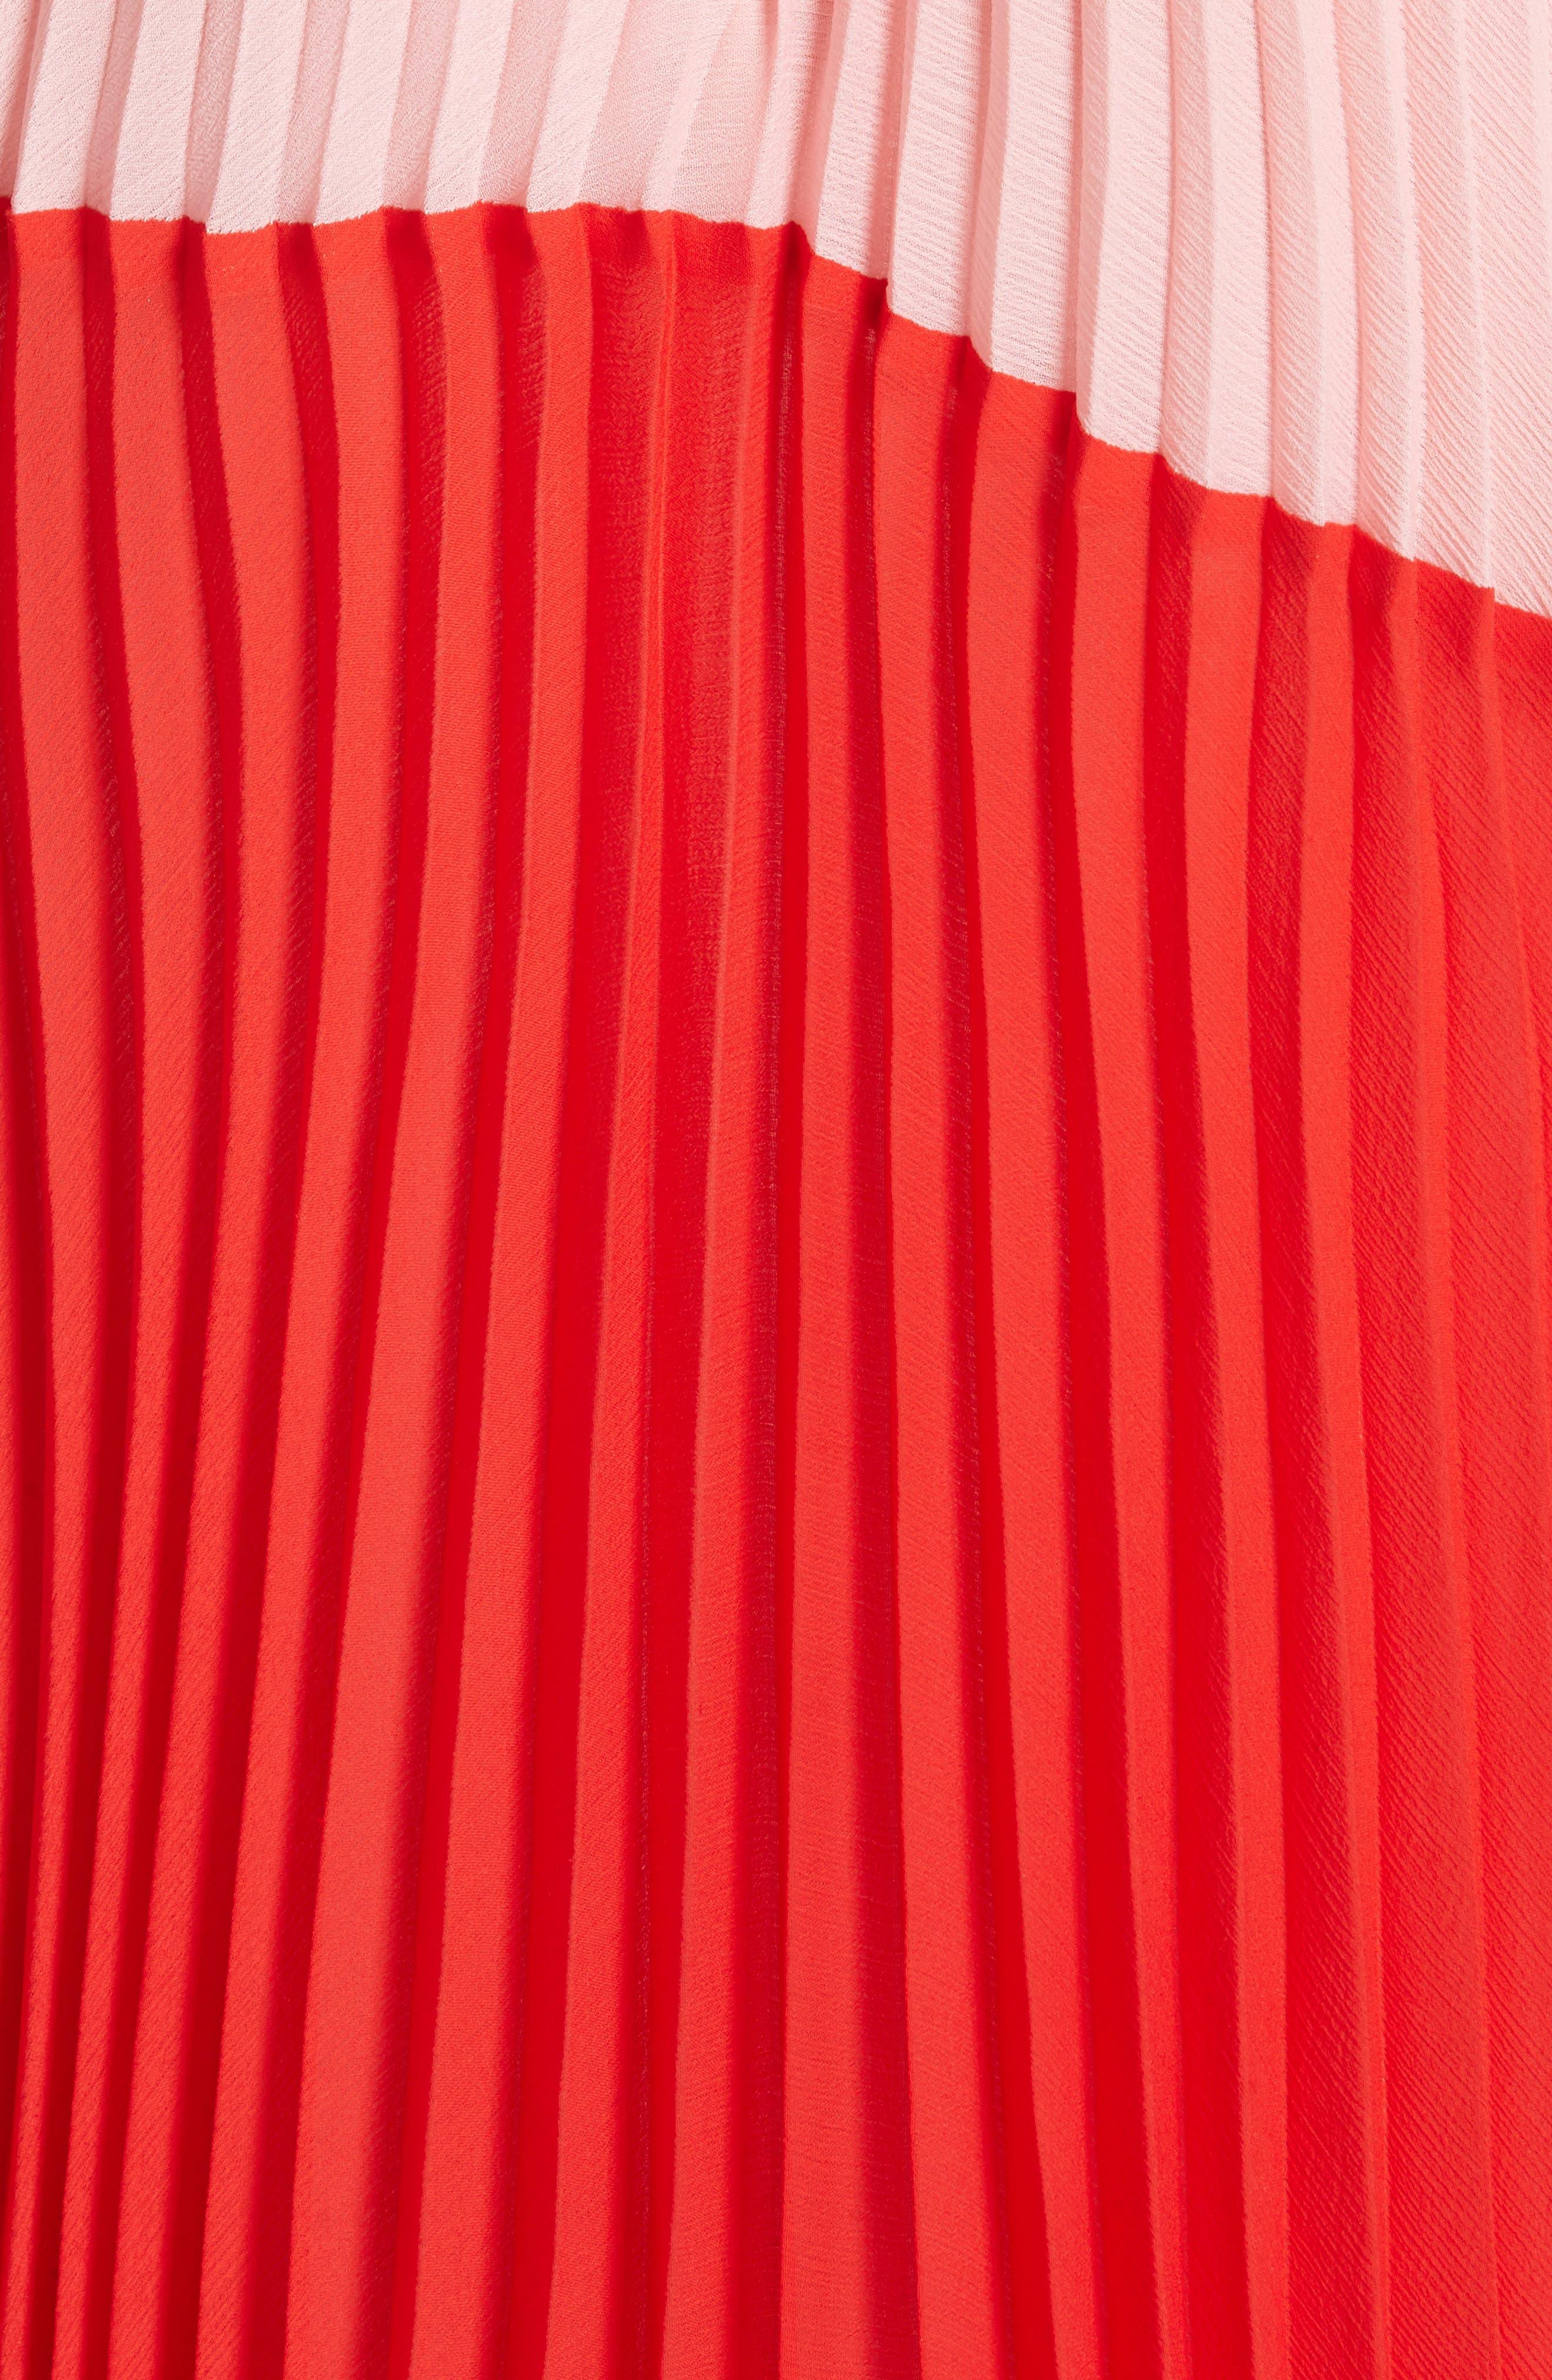 Rozlyn Pleat Colorblock Maxi Dress,                             Alternate thumbnail 5, color,                             615